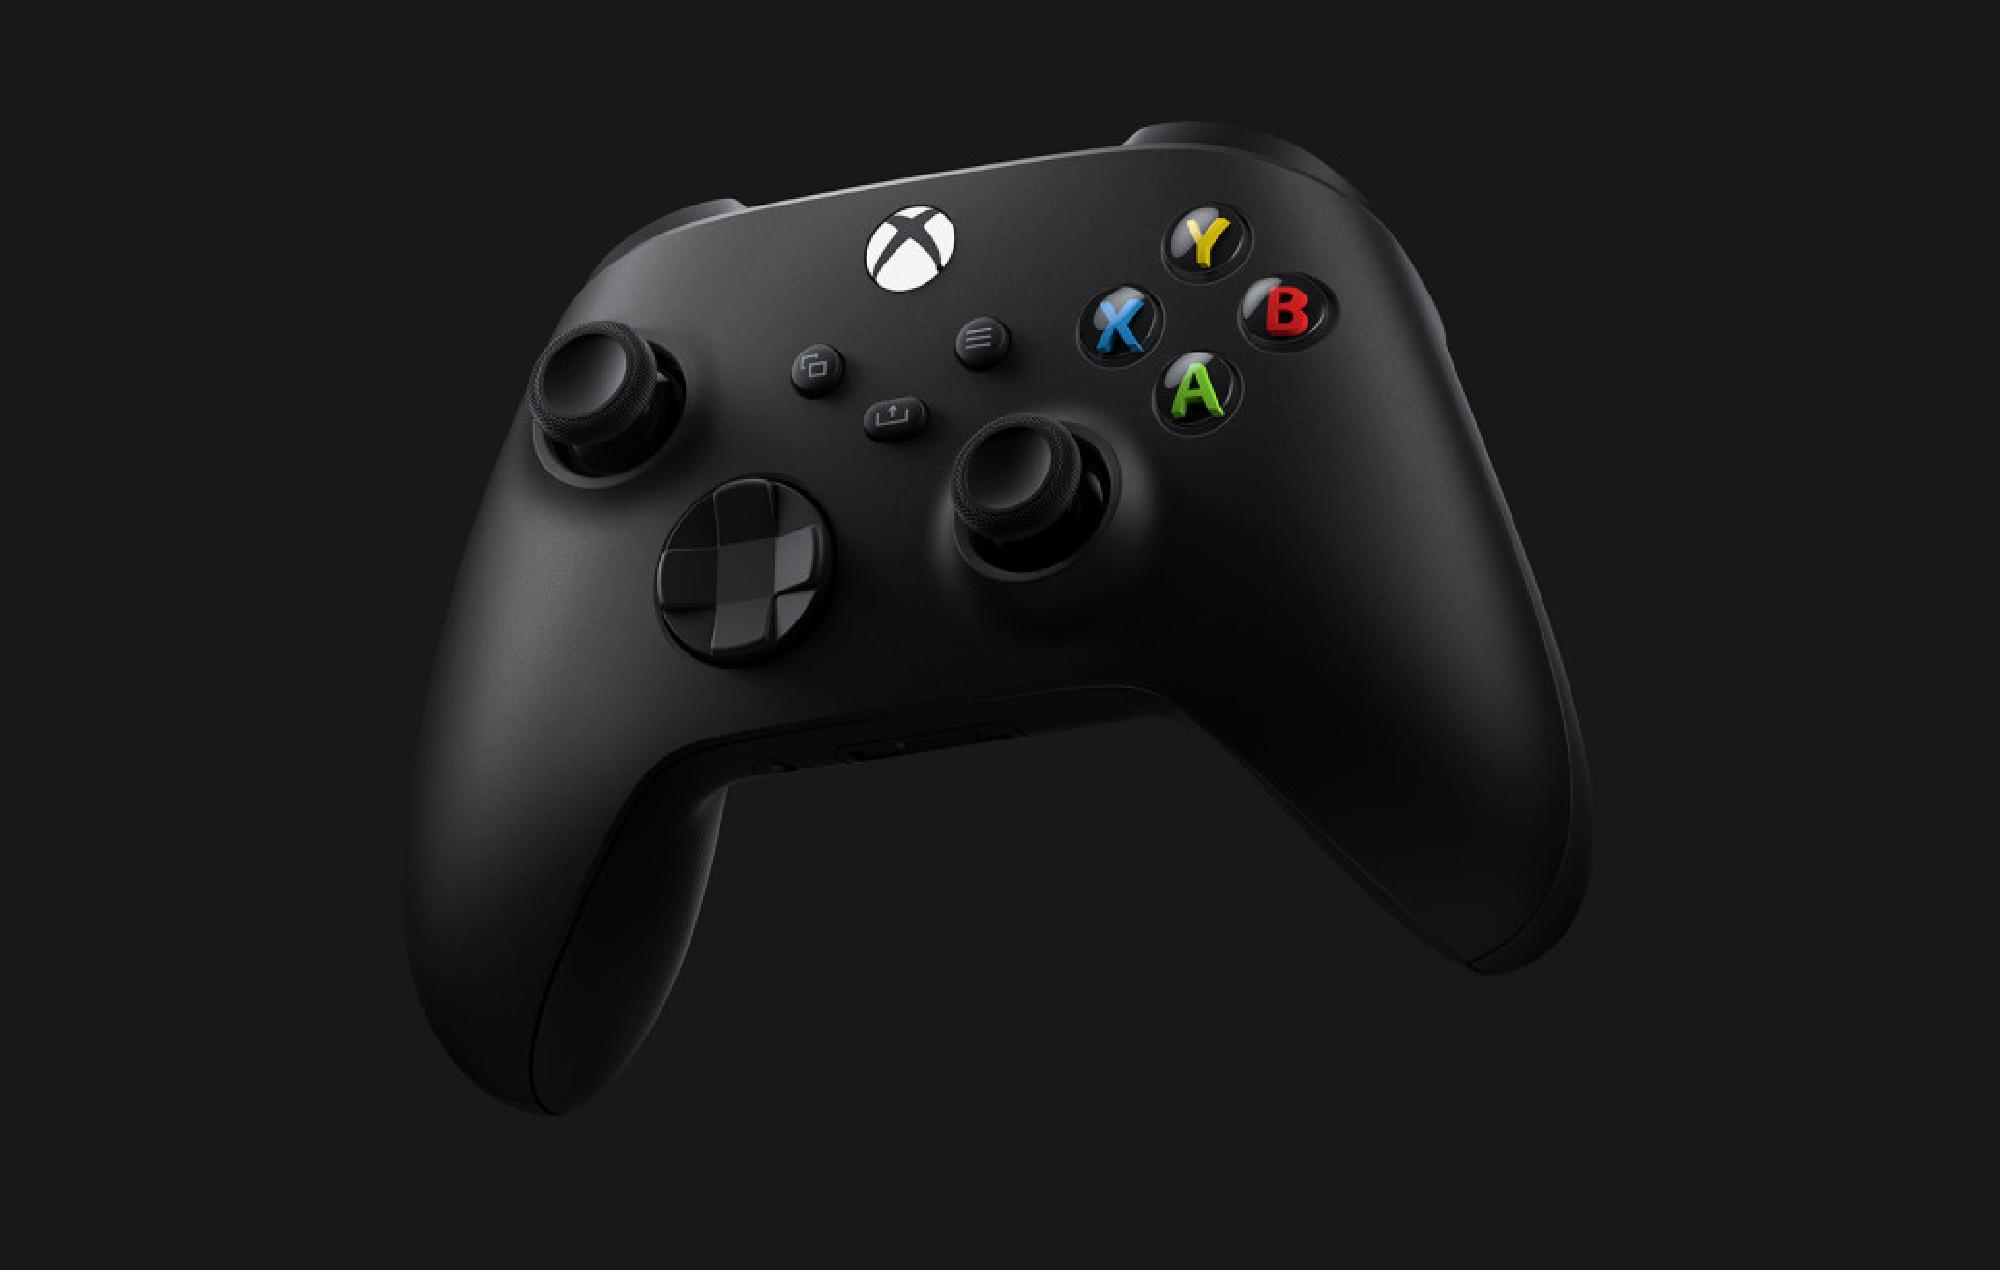 Xbox Series X's controller